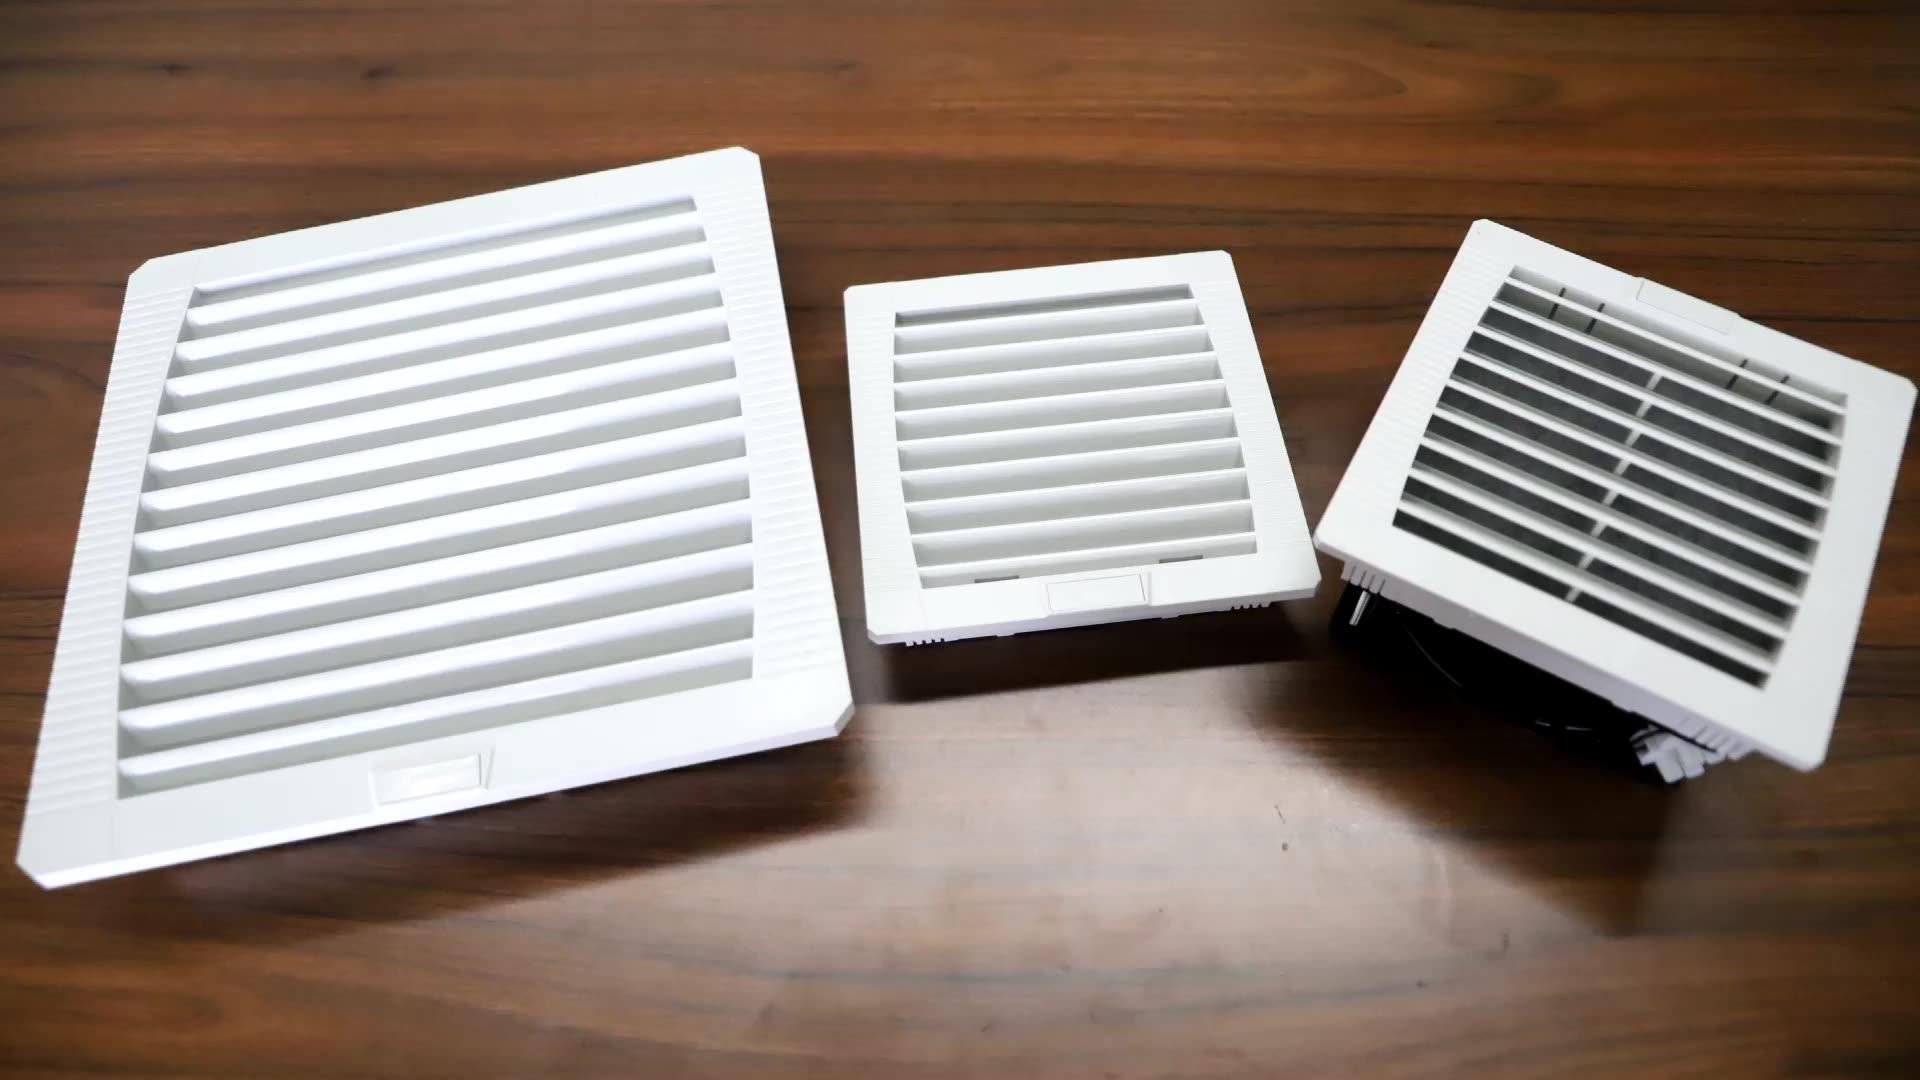 145*145 Mm Filter Industri Kipas Angin Listrik Kabinet Kipas Pendingin Exhaust Filter